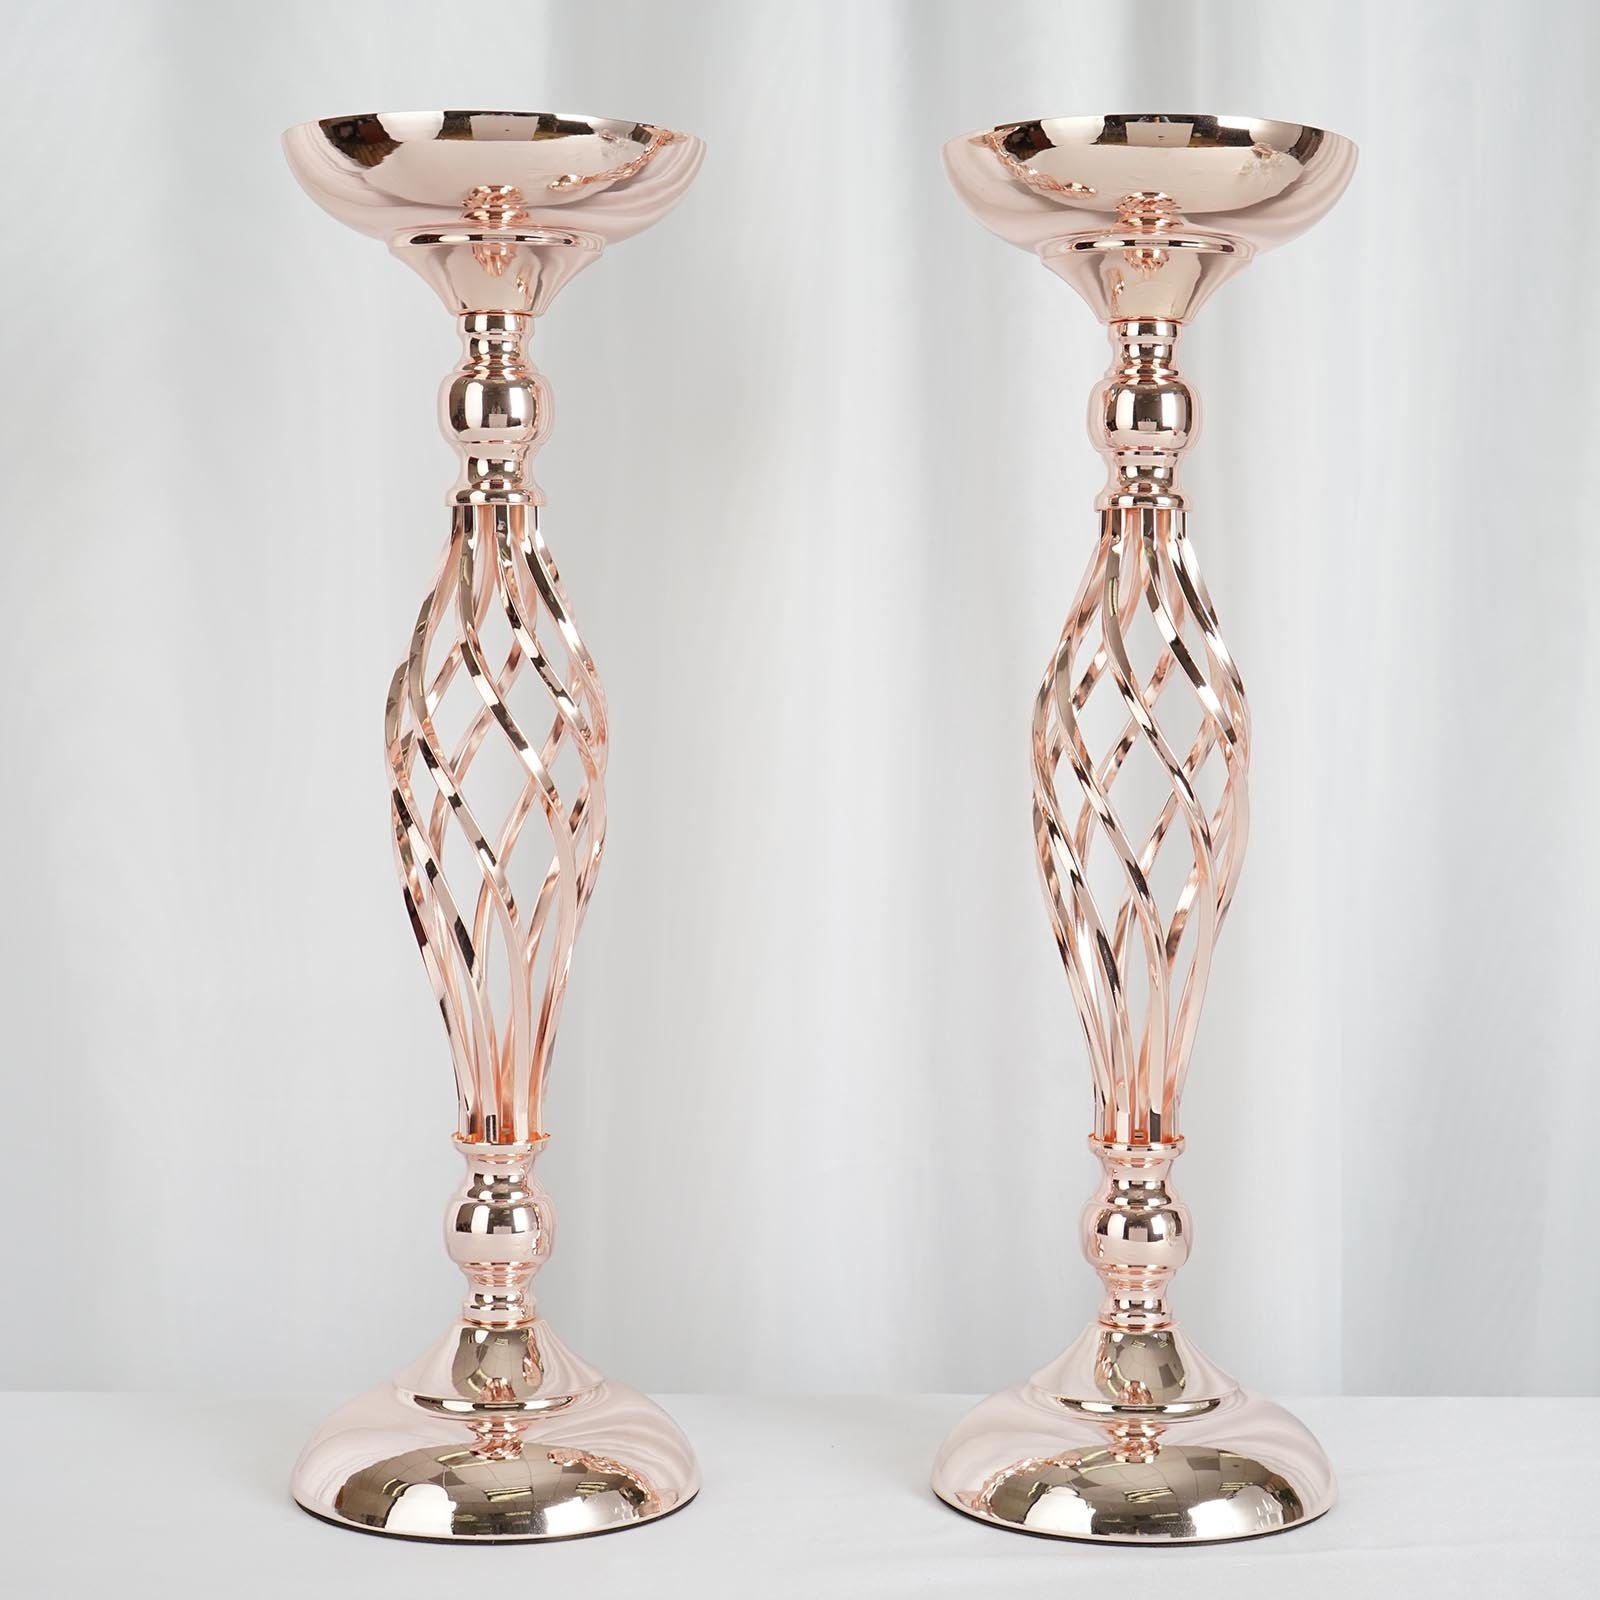 2 pcs 22 5 tall candle holder wedding vase centerpiece decorations wholesale ebay. Black Bedroom Furniture Sets. Home Design Ideas